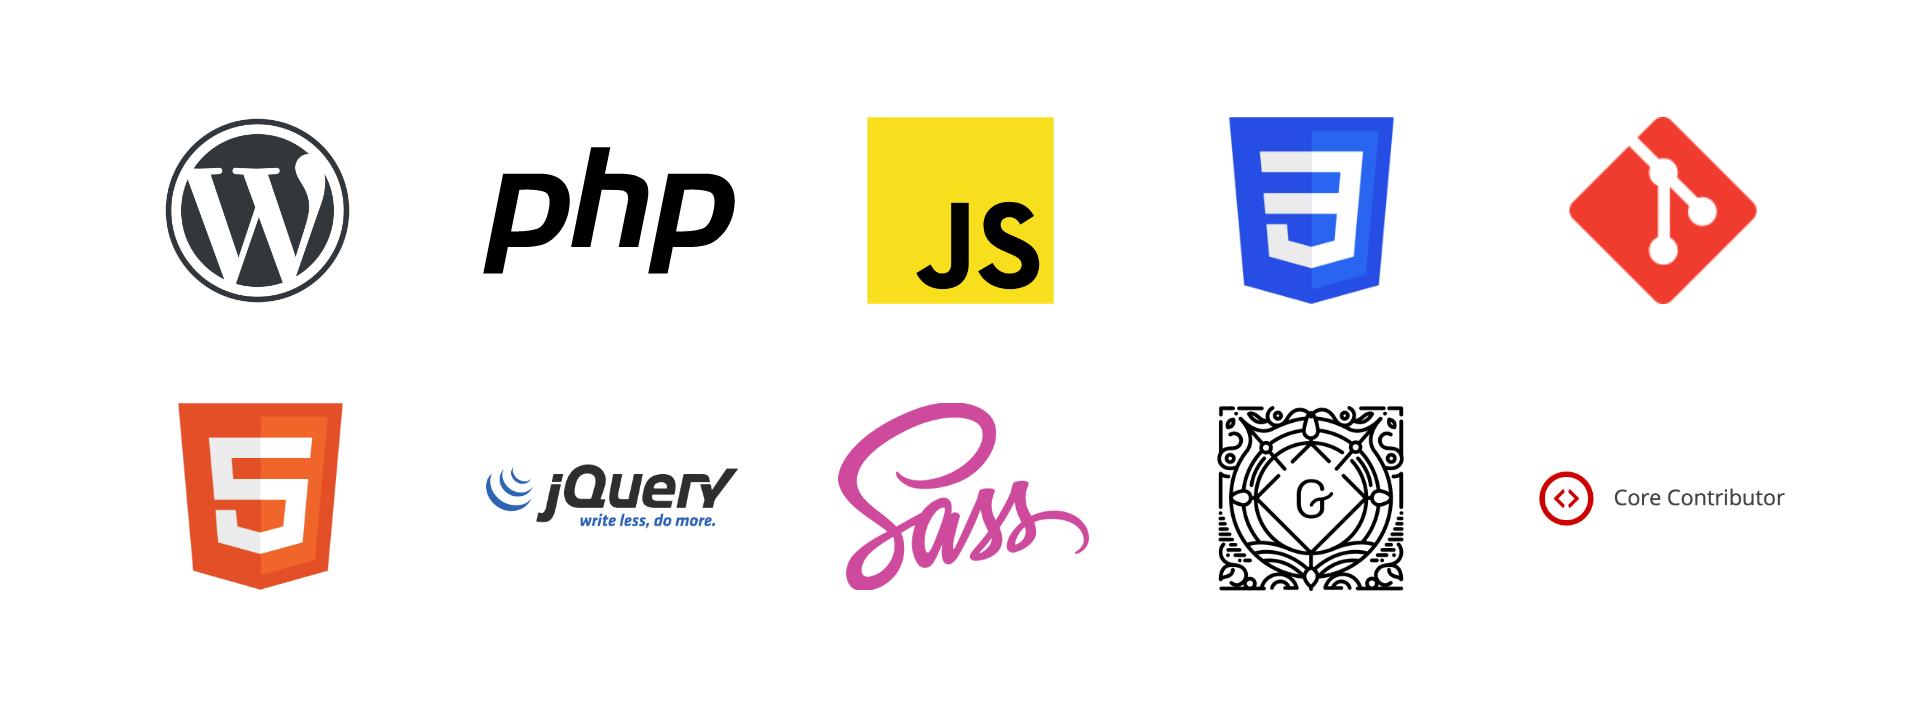 WordPress | PHP | JavaScript | CSS3 | Git | HTML5 | jQuery | Sass | Gutenberg | WordPress Core Contributor